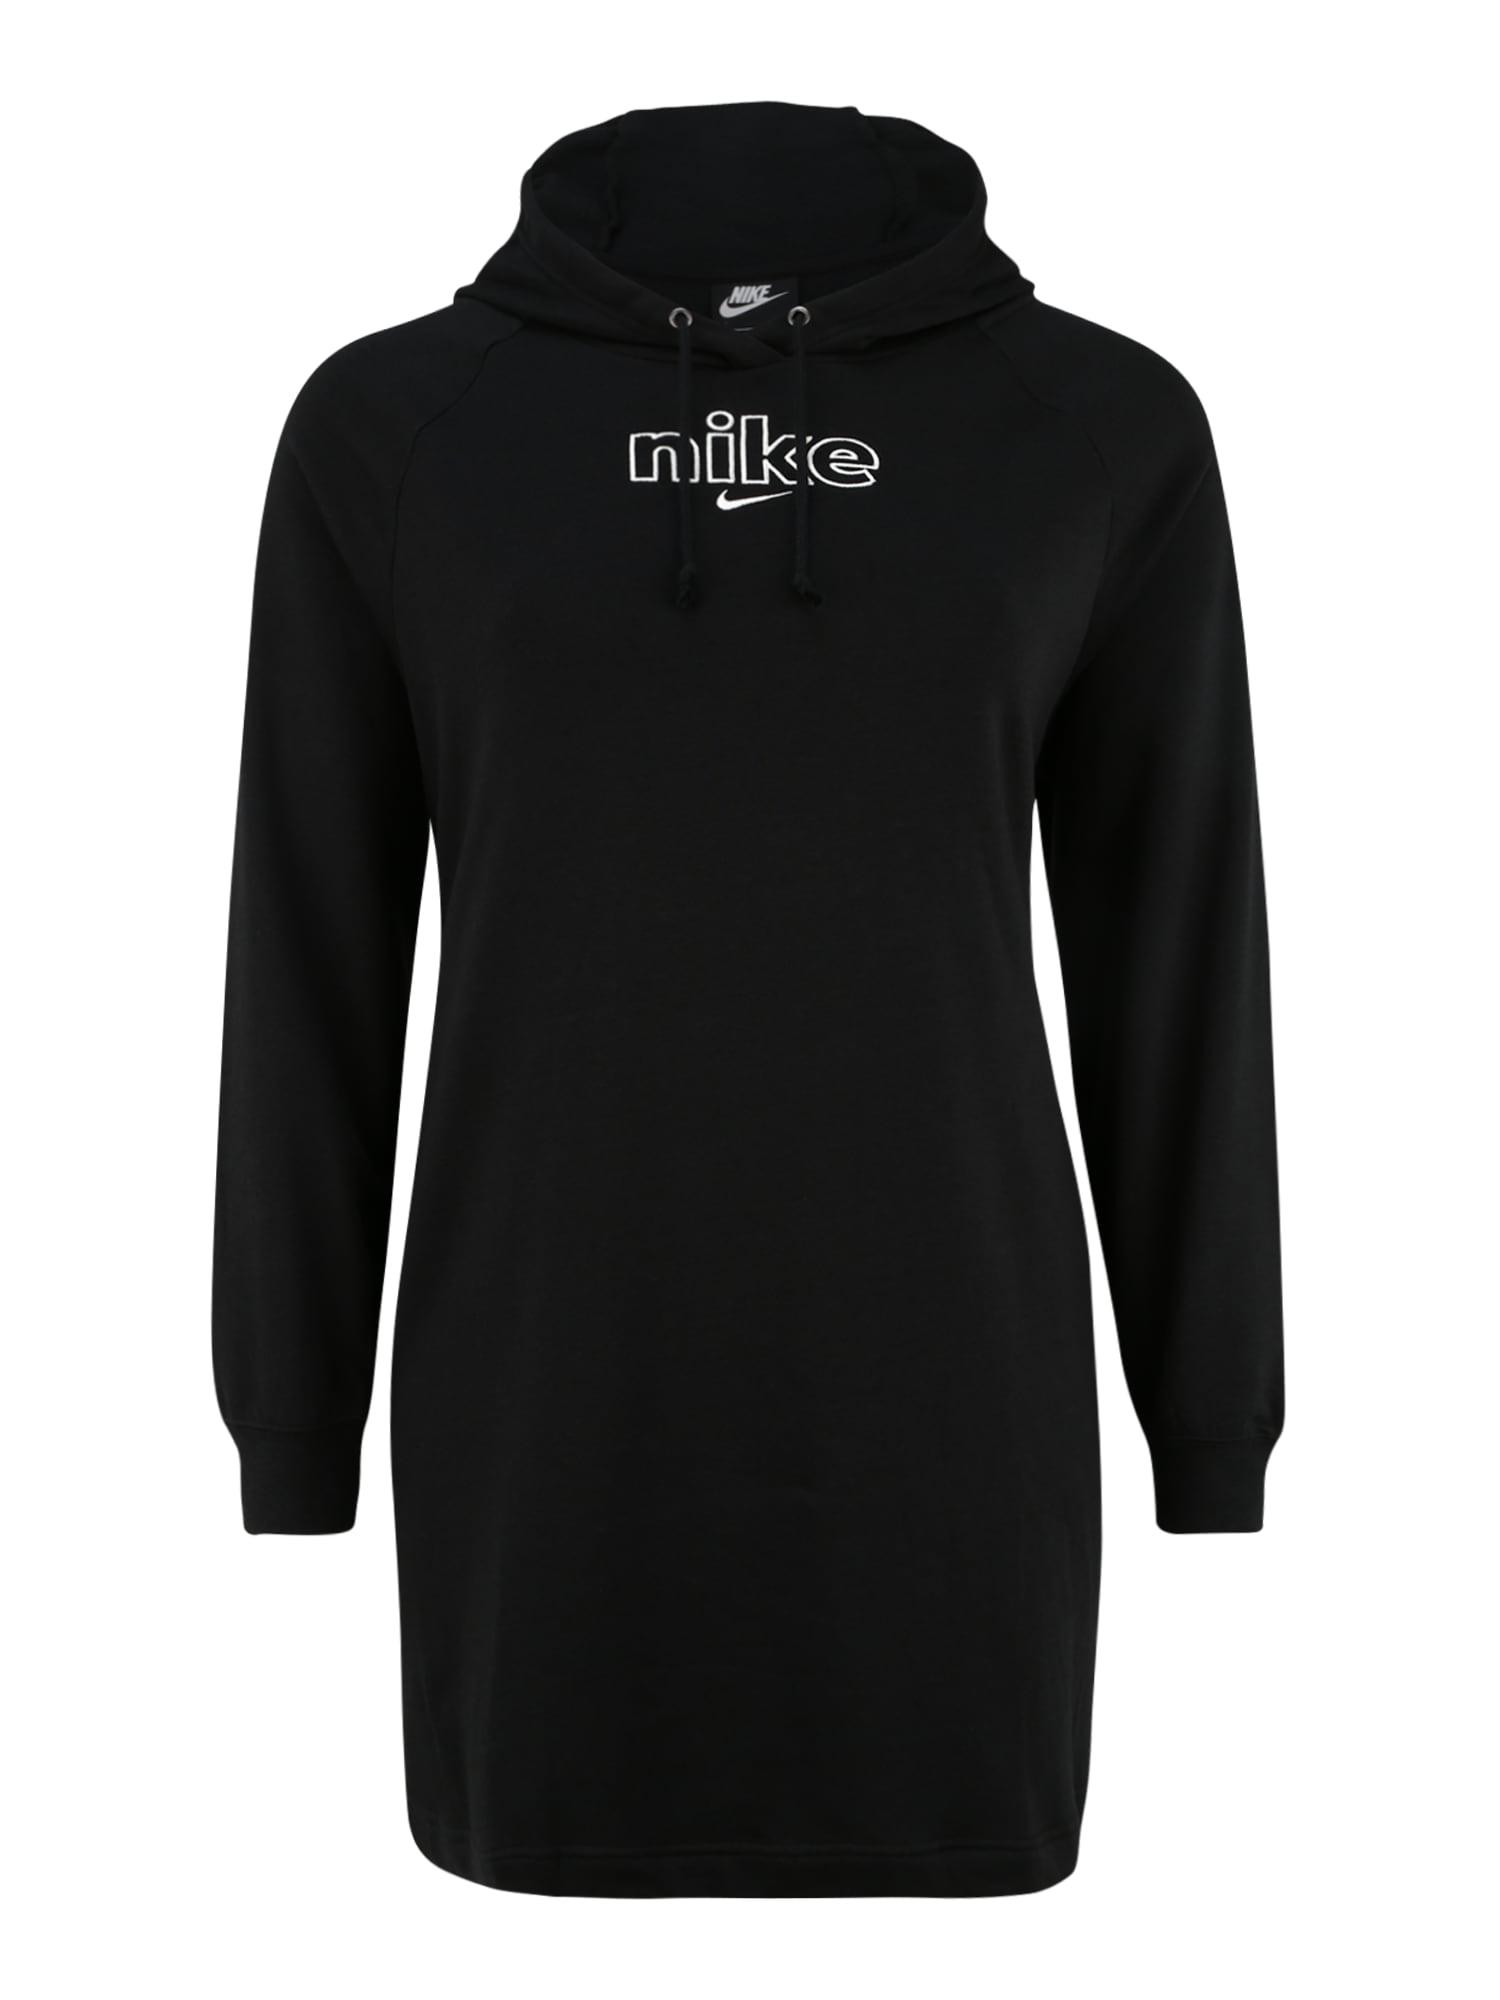 Nike Sportswear Suknelė juoda / balta